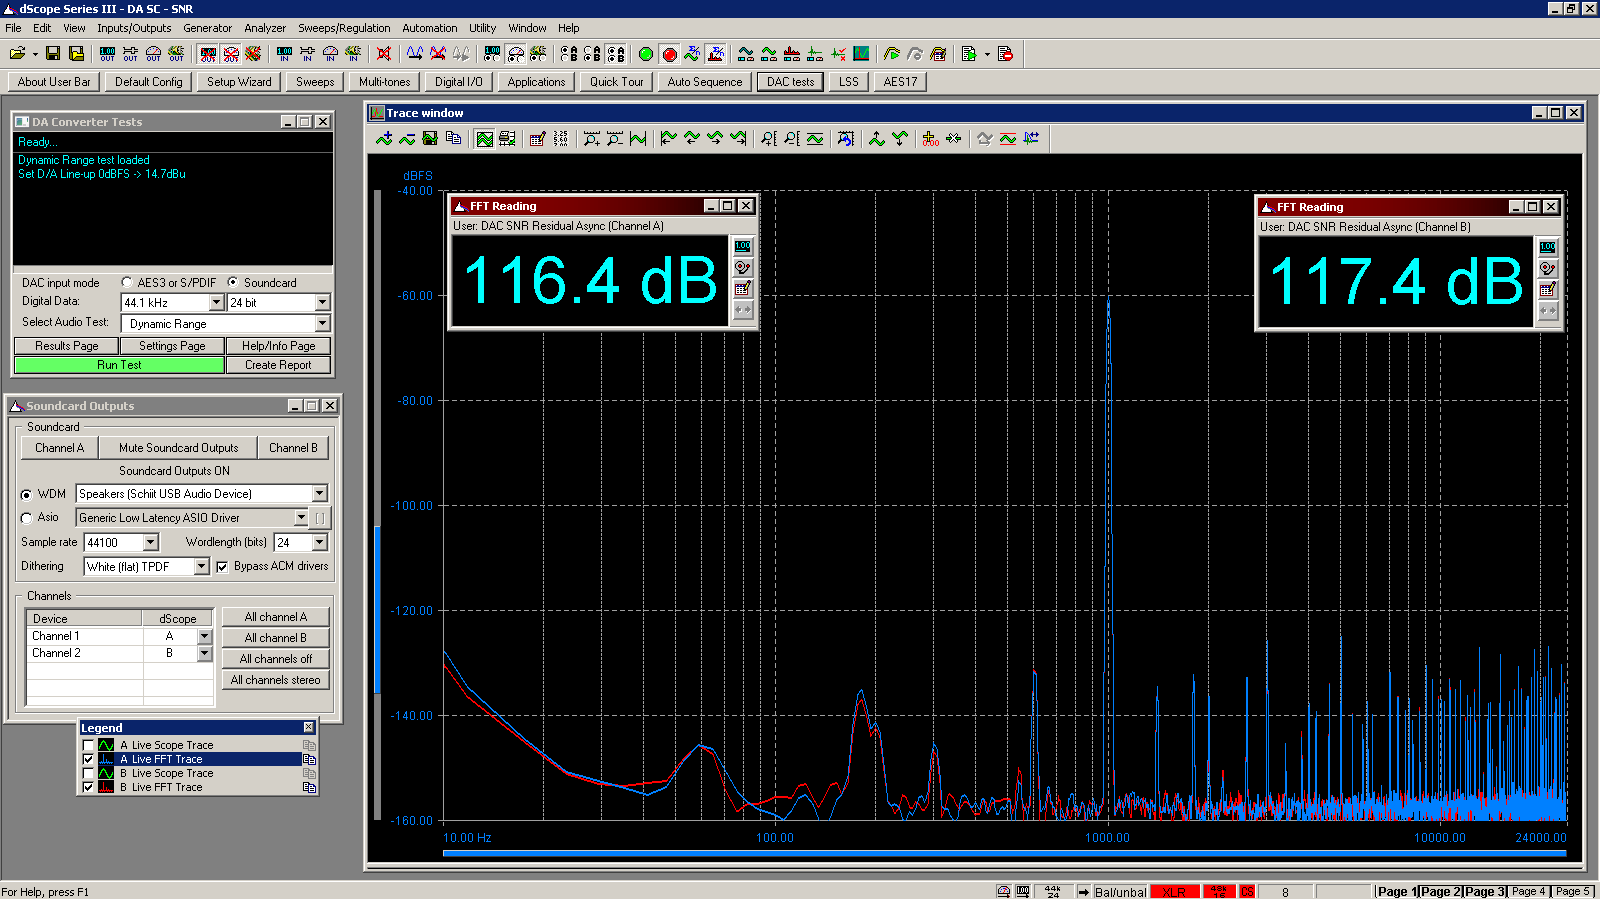 20150925 Gungnir MB dynamic range.PNG